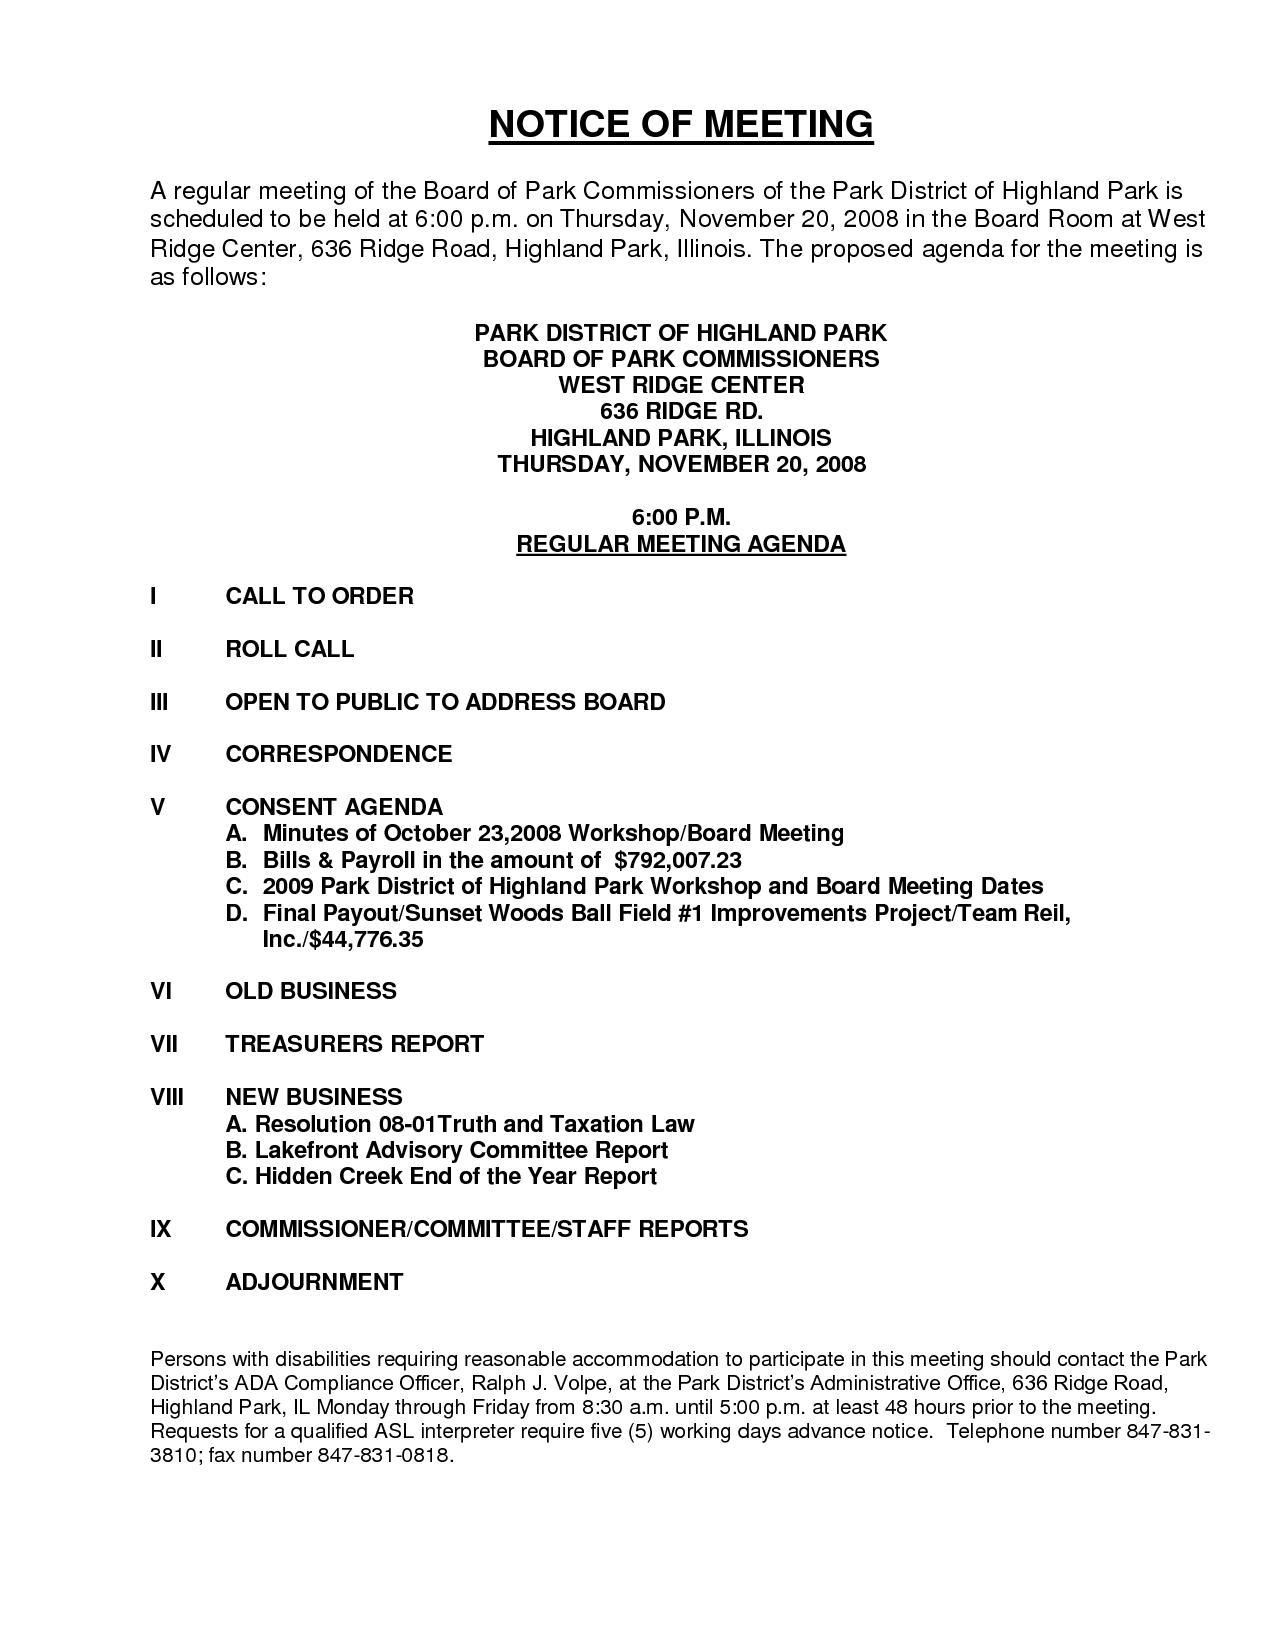 Board Of Directors Meeting Notice Format